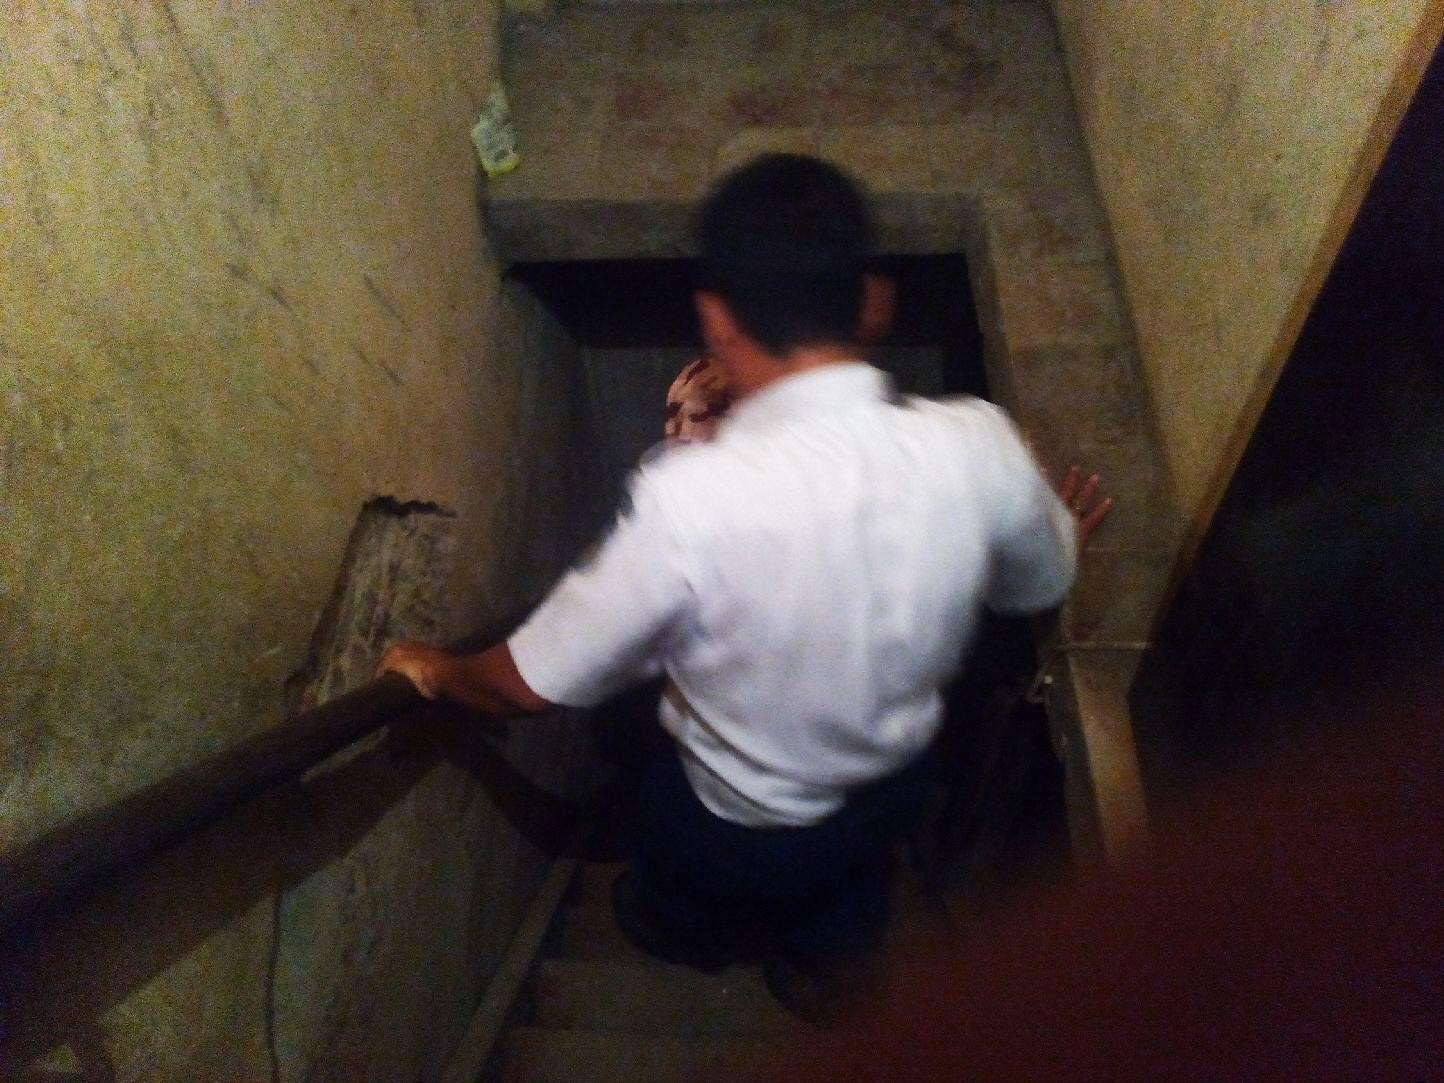 Lorong bawah tanah Gedung Lawangsewu, Kota Semarang Jawa Tengah. (Edhie Prayitno Ige/Liputan6.com)